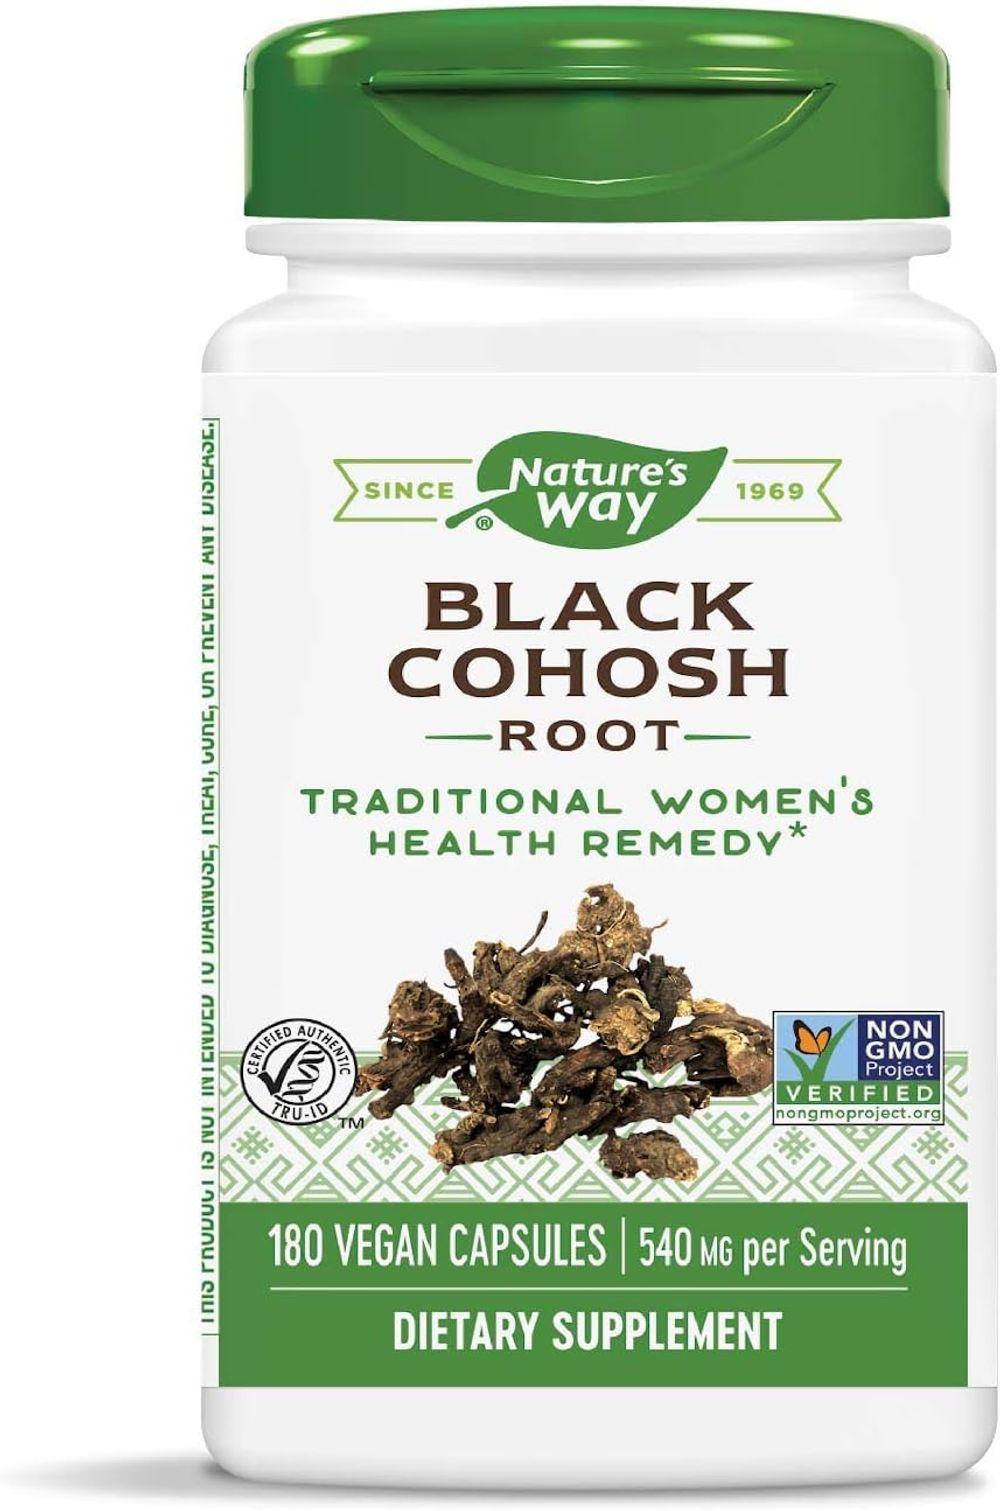 Nature's Way Black Cohosh Root, 540 mg per serving, Non-GMO, Gluten Free, 180 Capsules